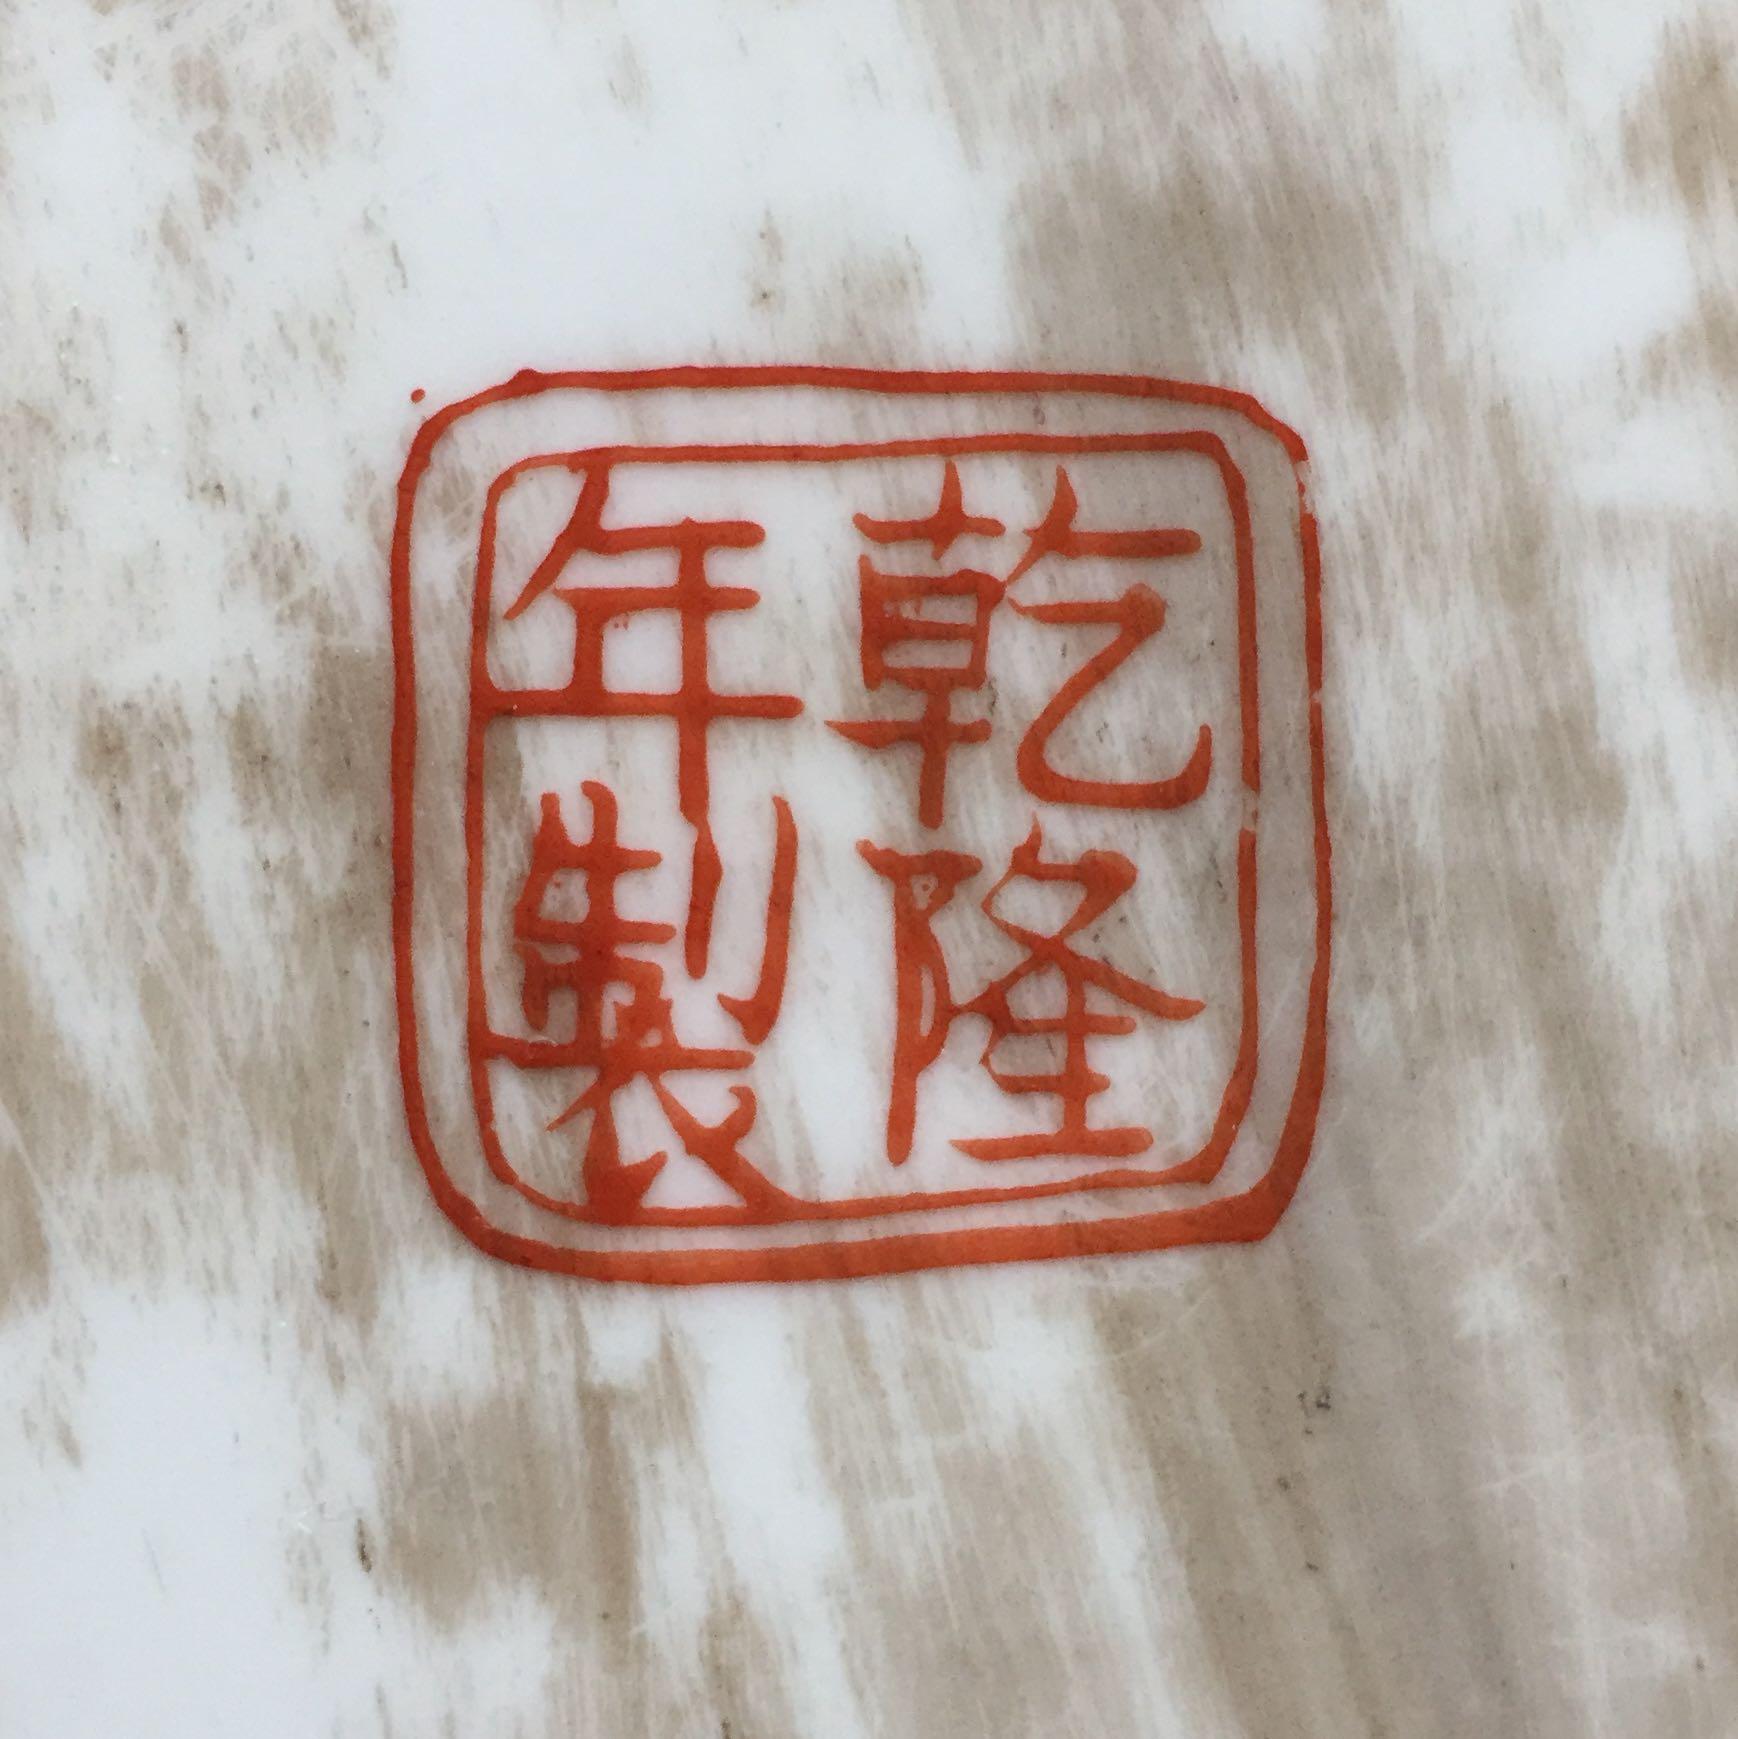 chinesische porzellanmanufaktur china porzellan manufaktur. Black Bedroom Furniture Sets. Home Design Ideas